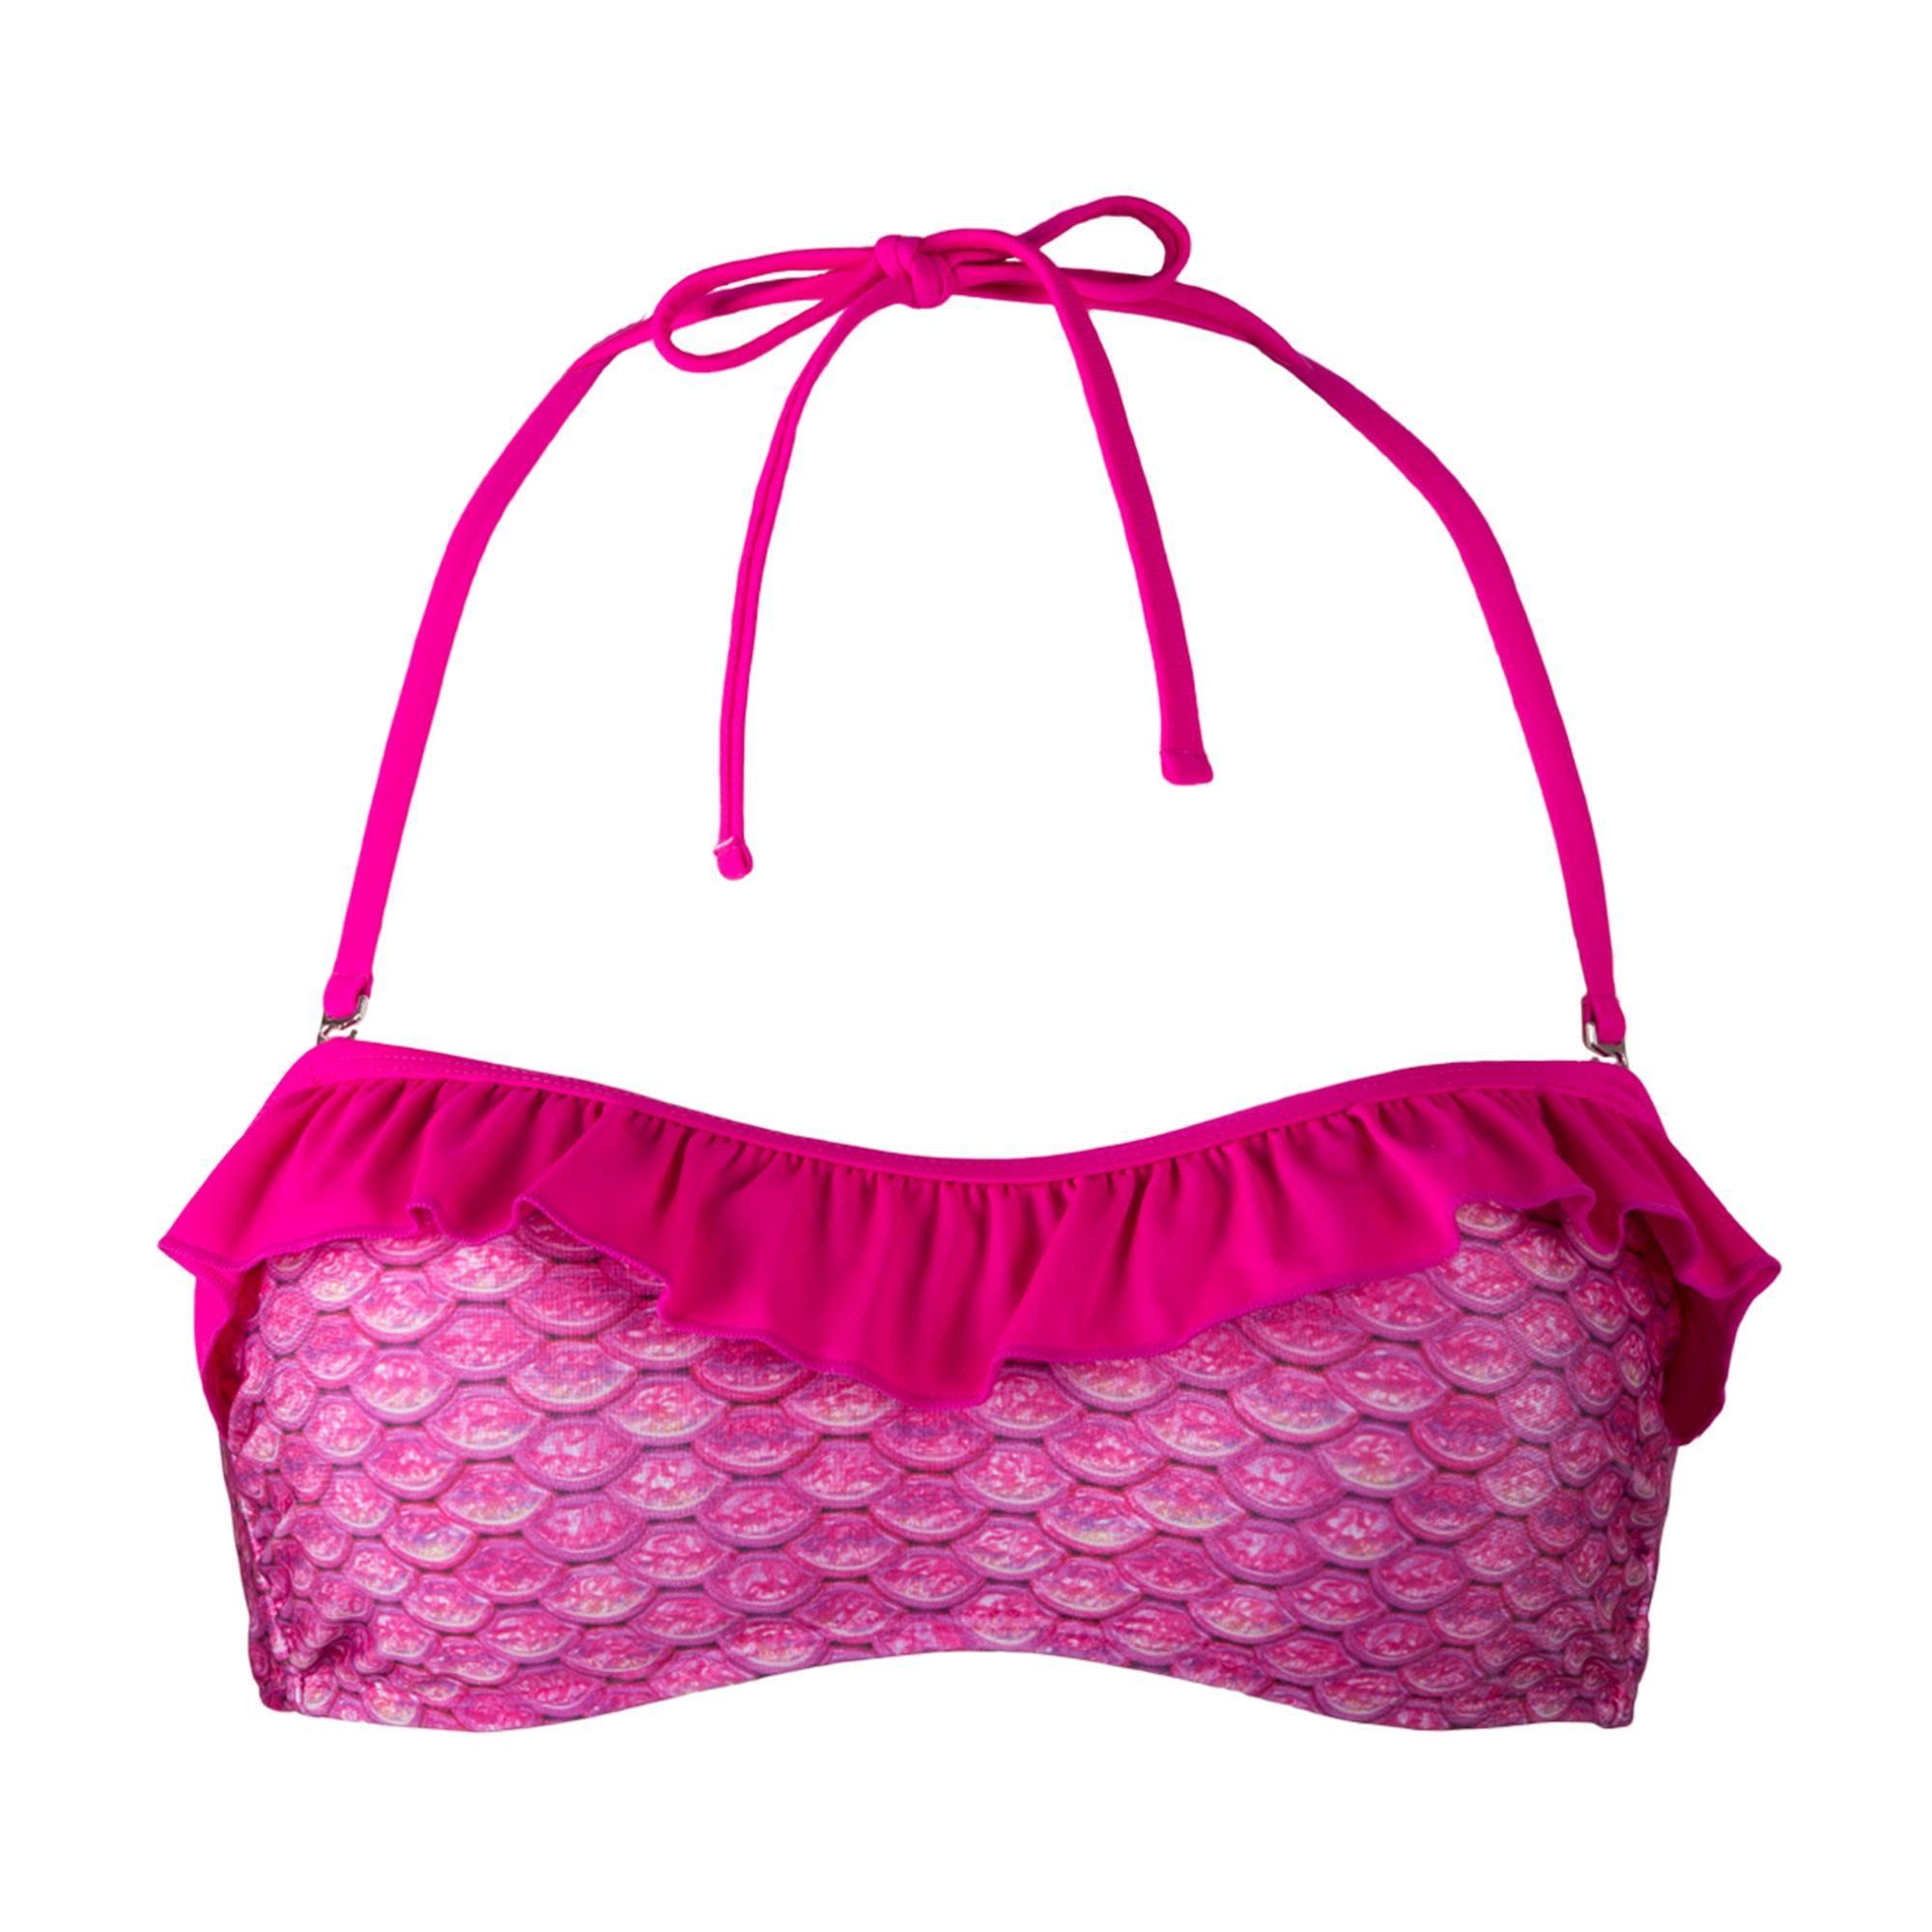 64e04459e9794 Original Malibu Pink Bandeau Bikini Top. Tap to expand